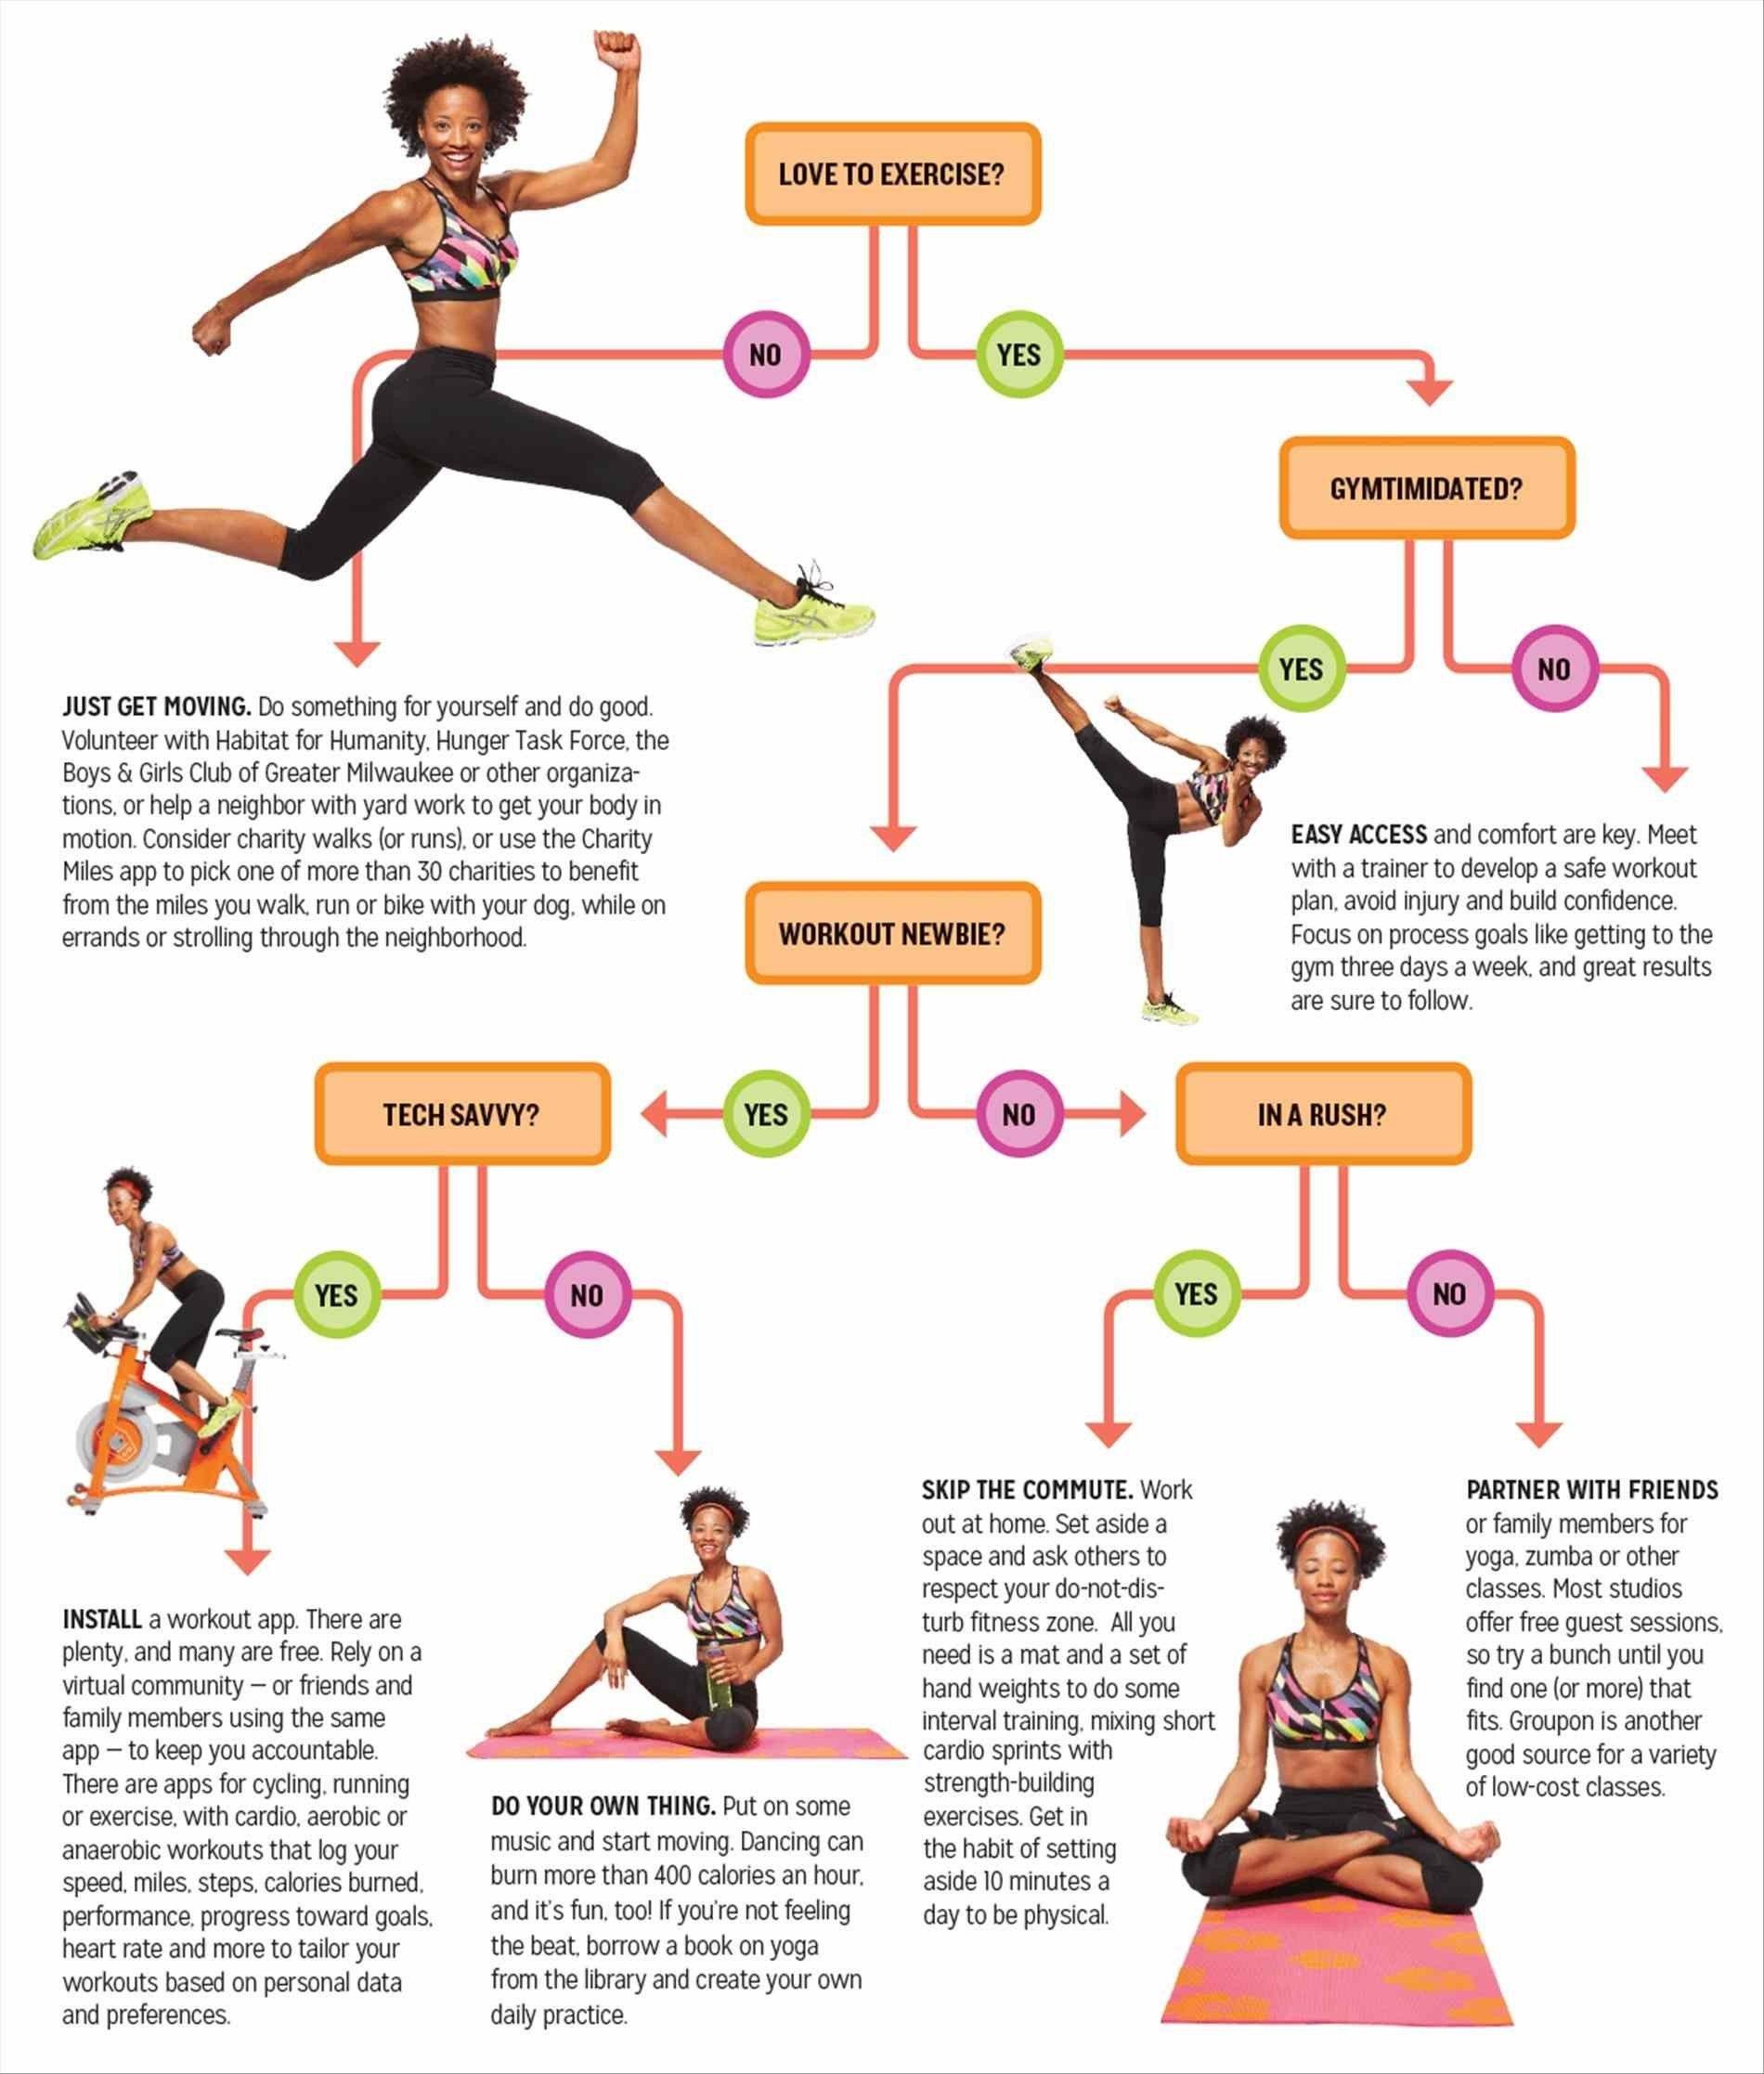 90 10 Basic Yoga Poses This Simple Yoga Workout Gives Beginner Yoga Workout Beginner Workout At Home Basic Yoga Poses